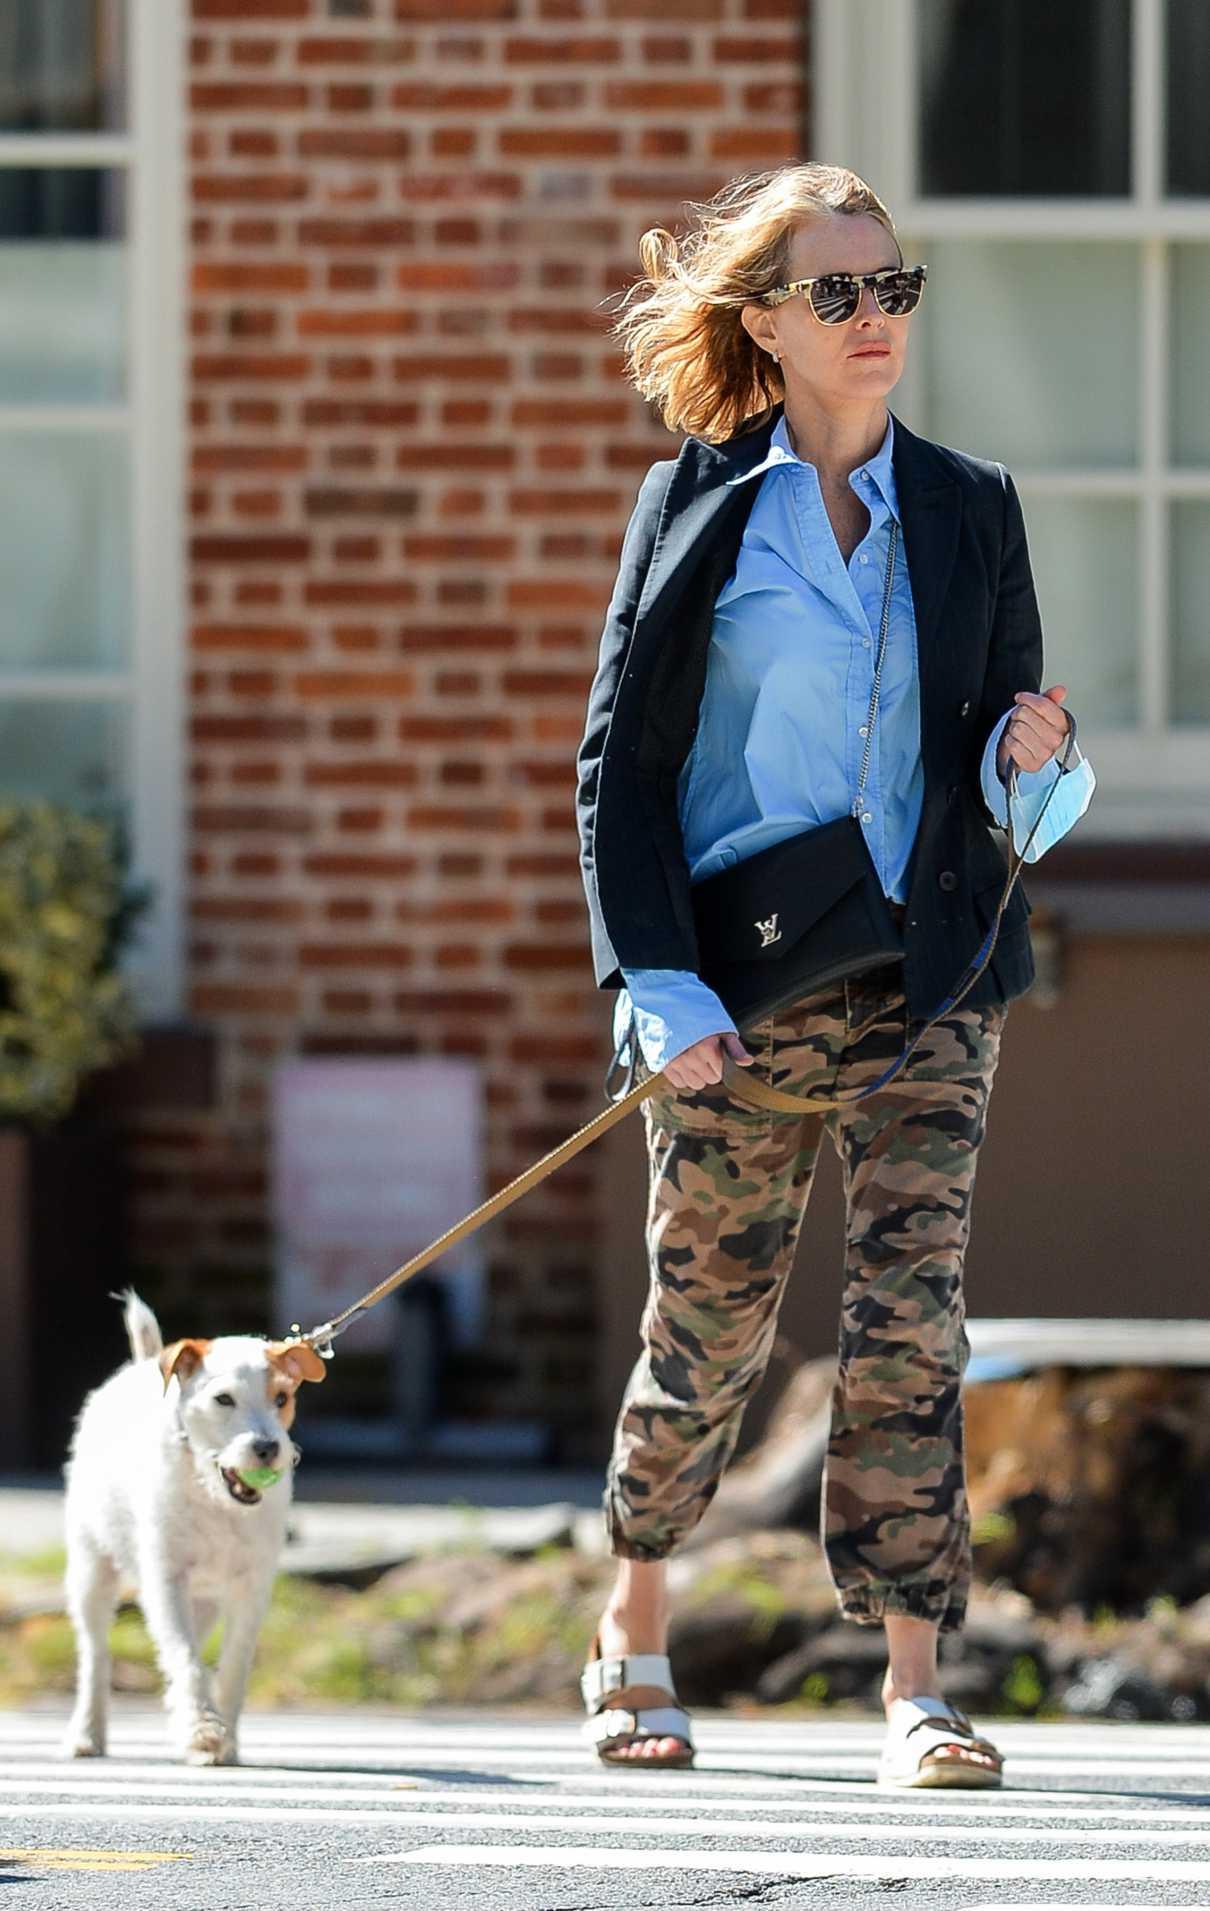 Naomi Watts in a Camo Pants